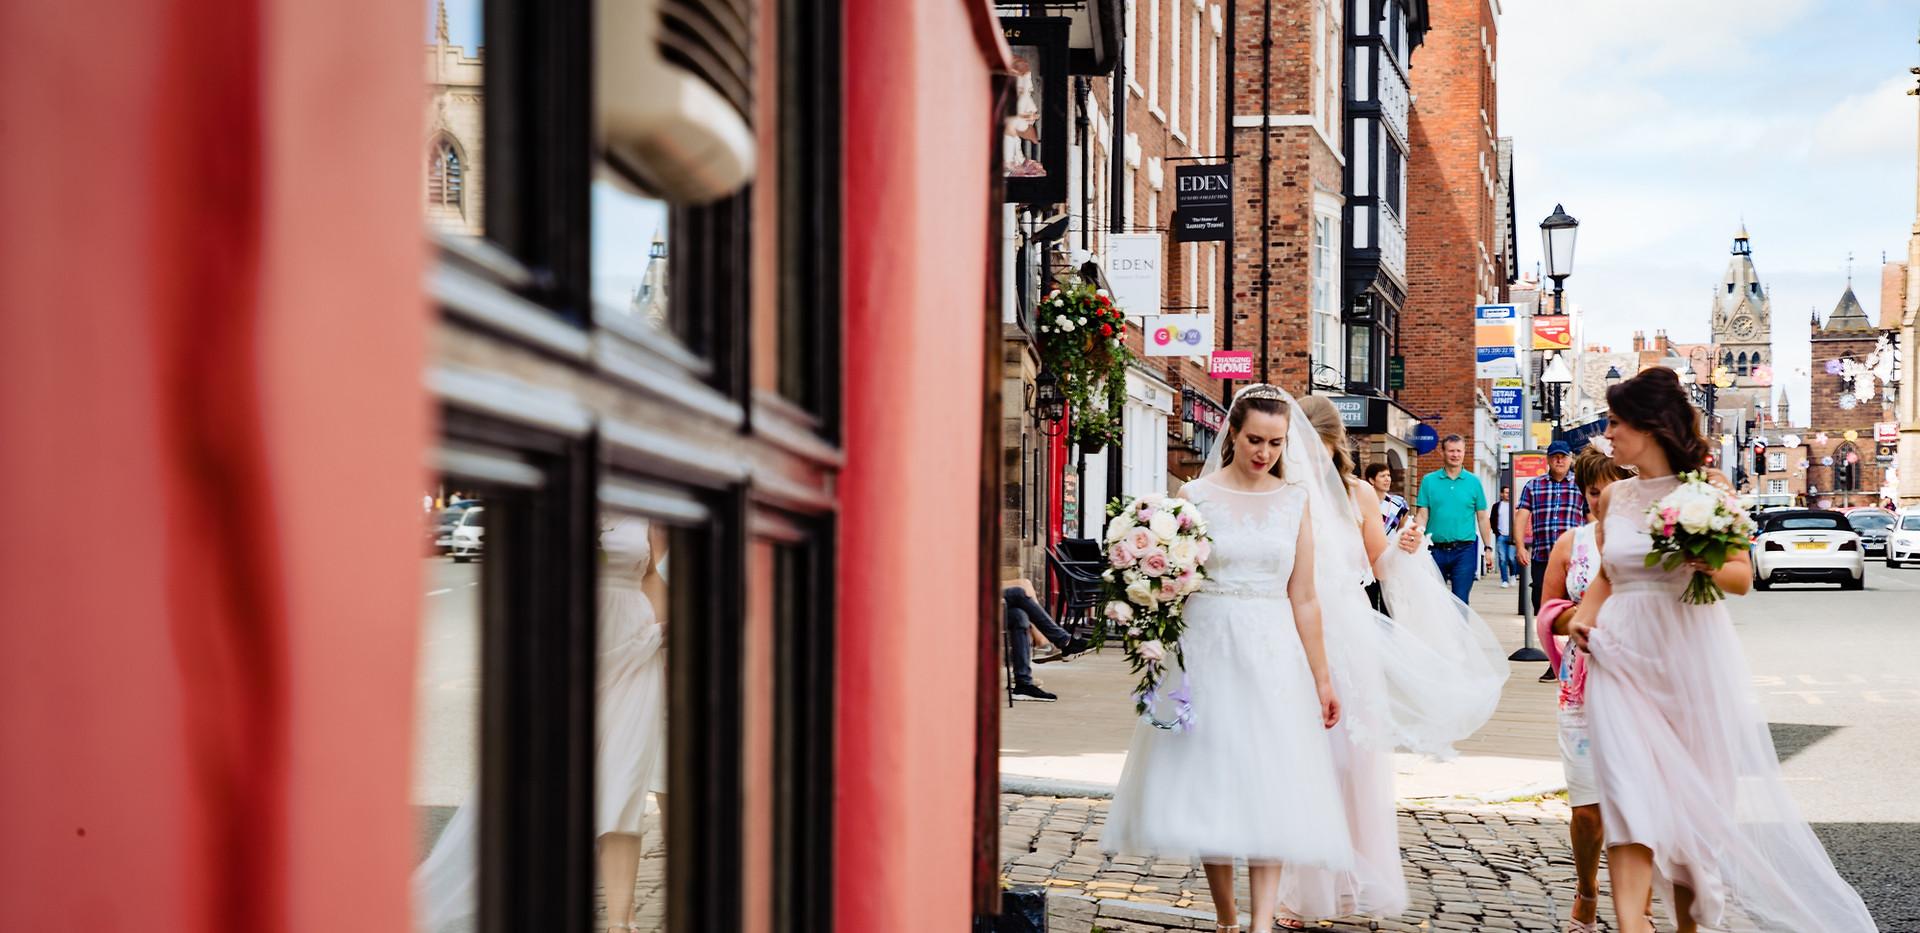 Oddfellows Wedding Photography___12.jpg